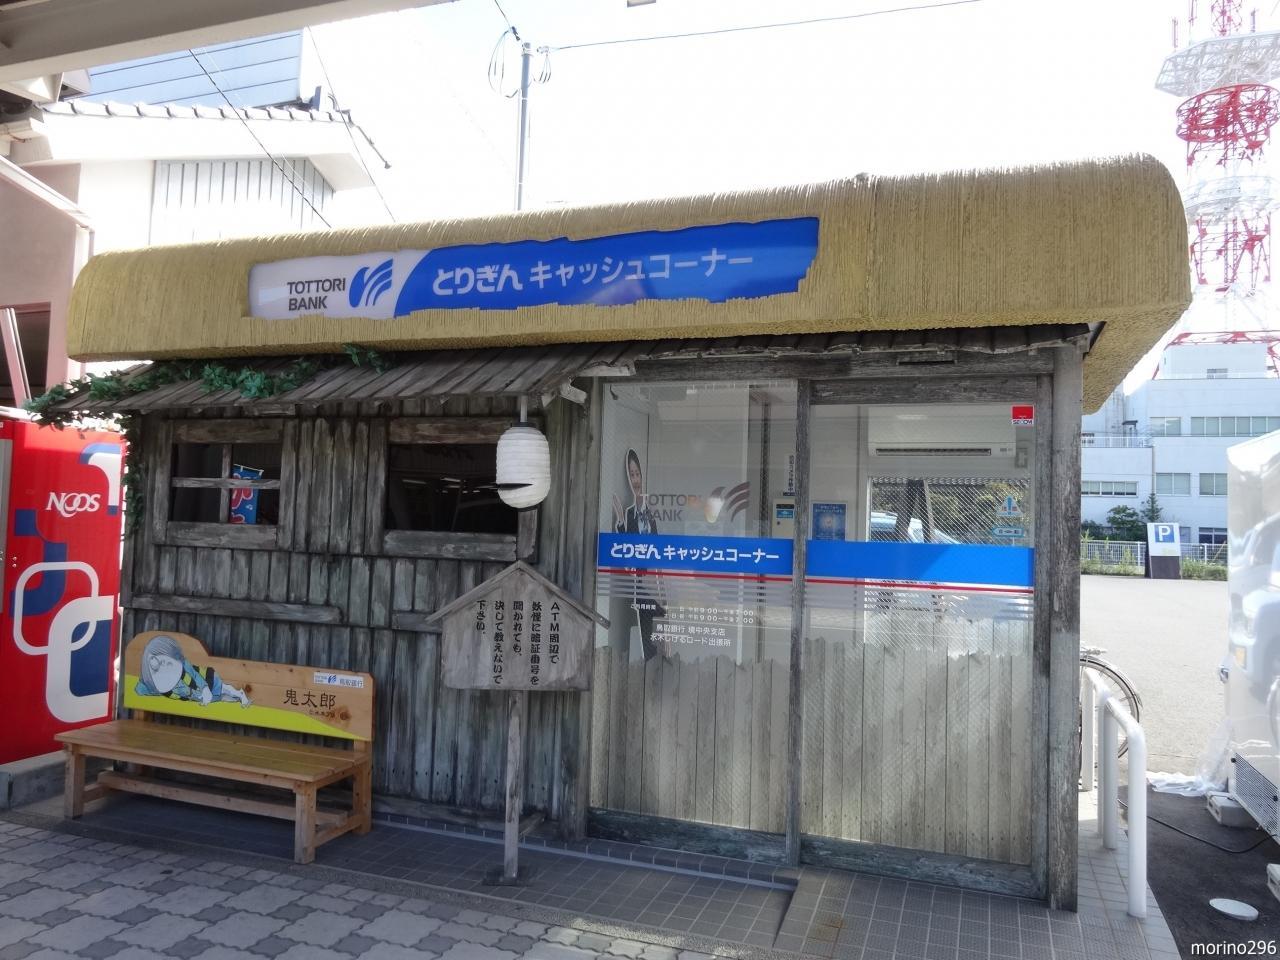 岩手県の店舗一覧 三菱UFJ銀行 - map.bk.mufg.jp